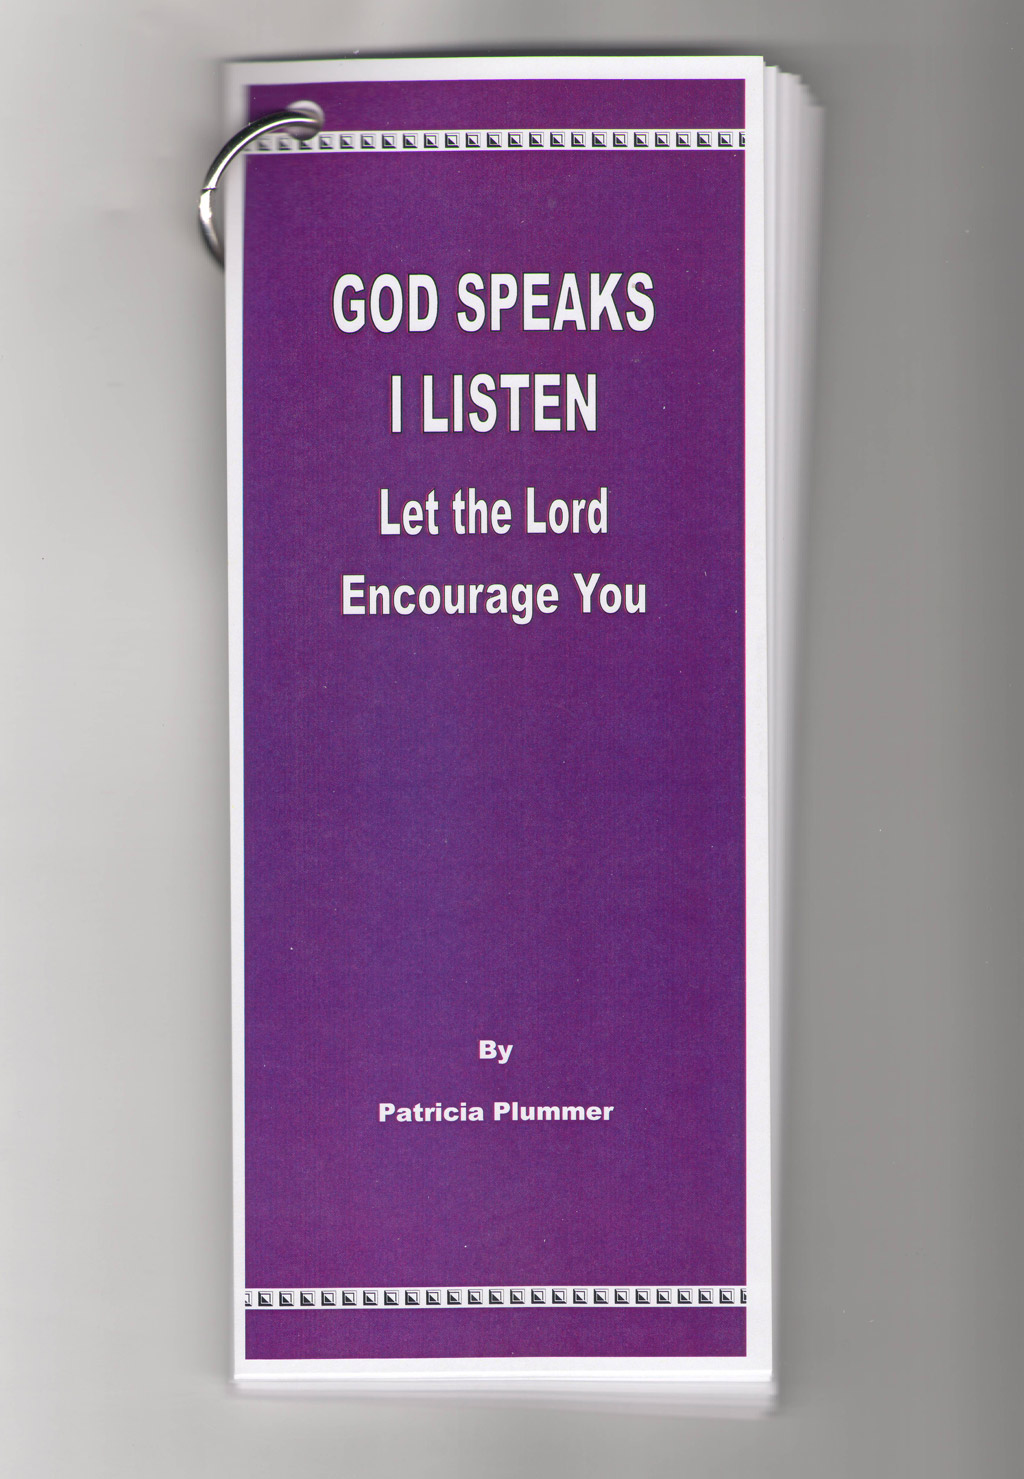 God Speaks I Listen, Let the Lord Encourage You